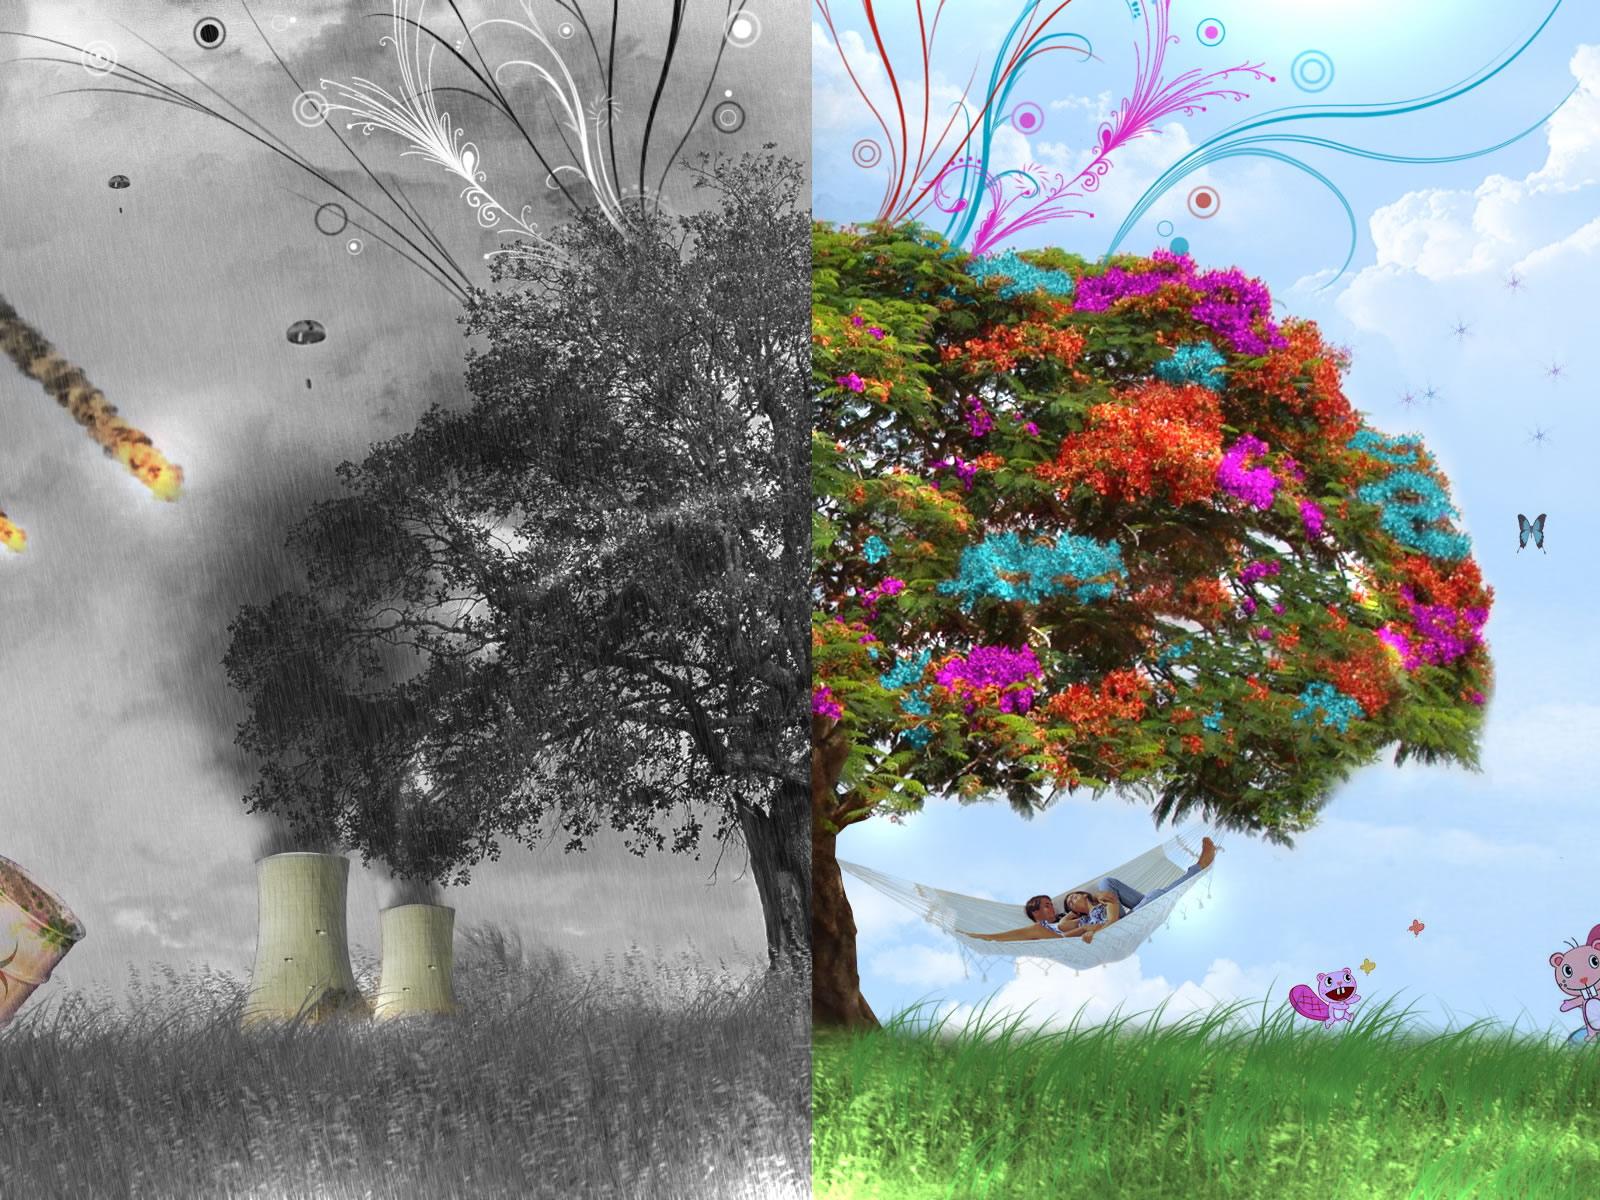 Nature Wallpapers 3d Tree Wallpaper 1600x1200